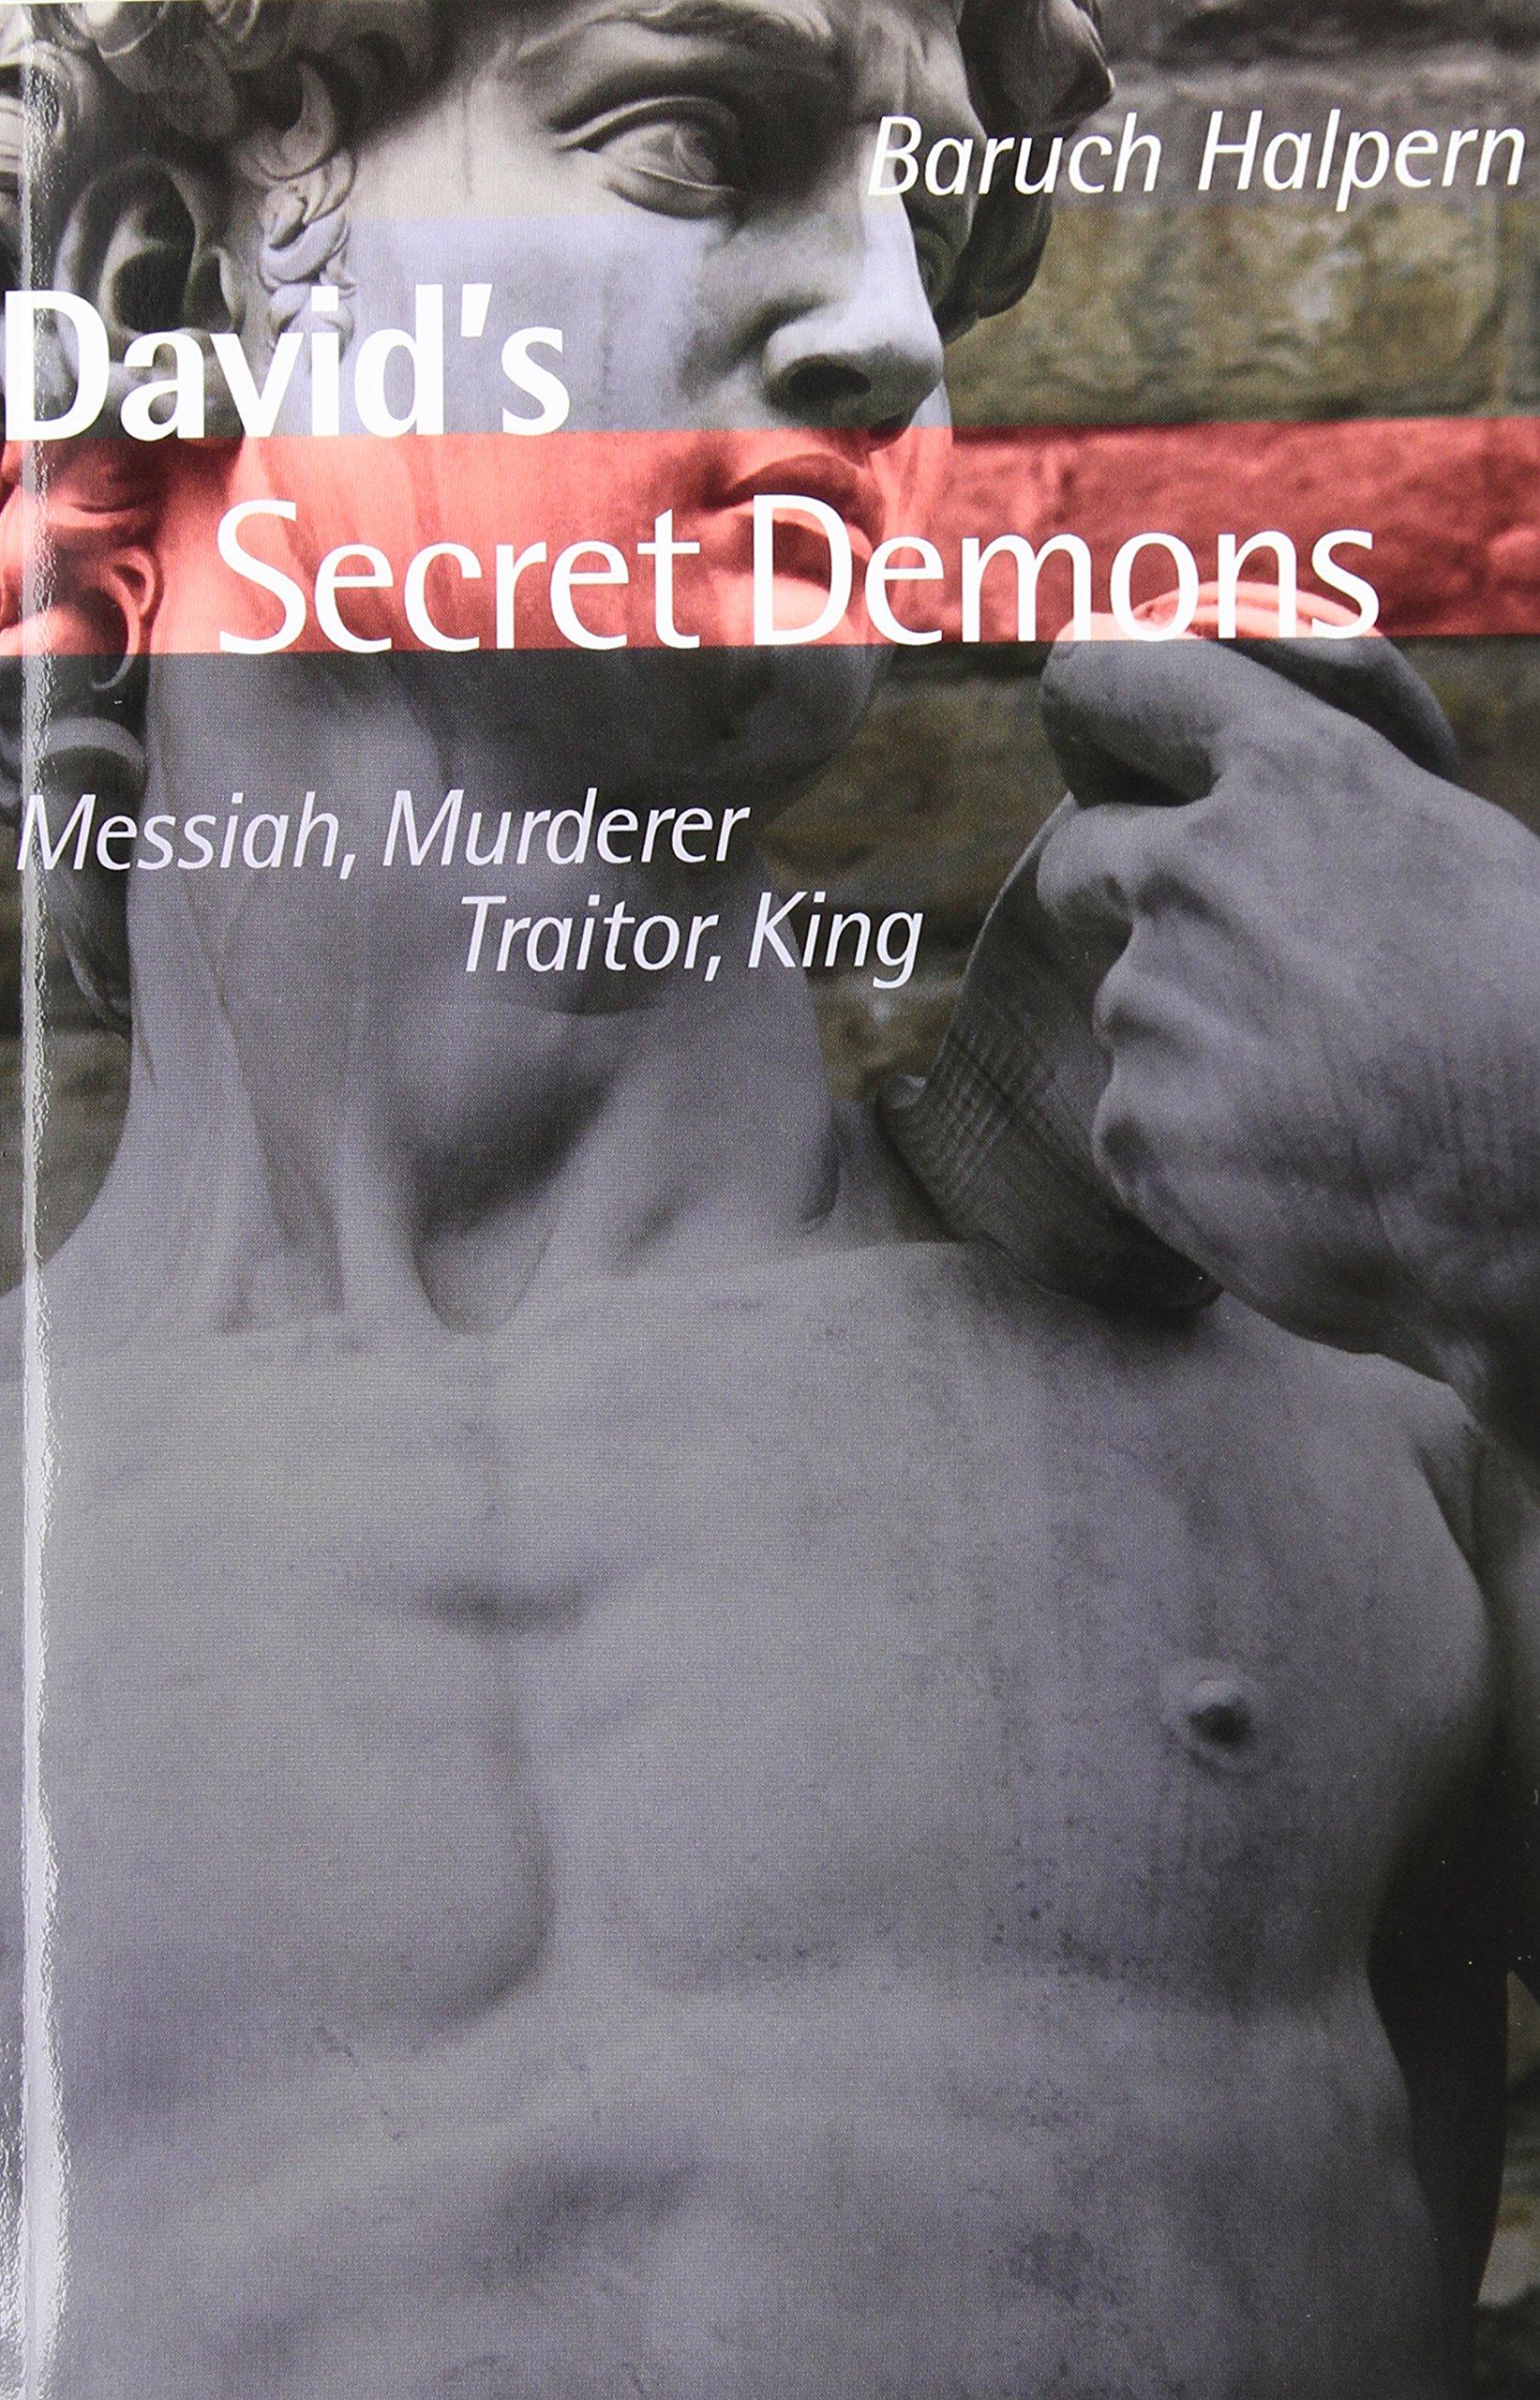 Davids Secret Demons.jpg